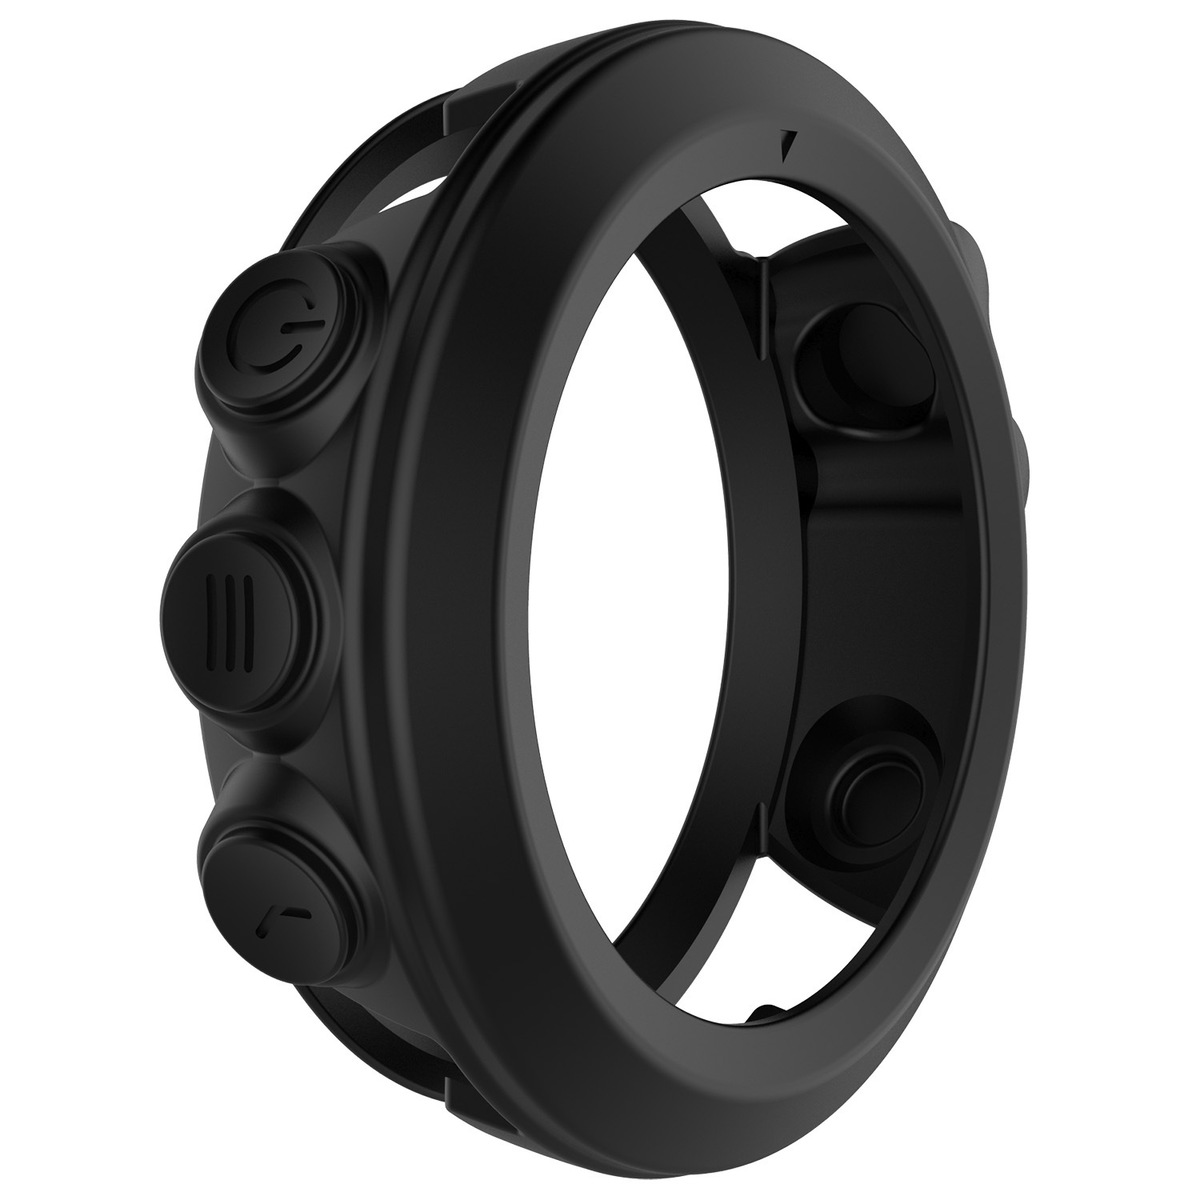 Protector Garmin Fenix 3-Sapphire/quatix 3/Fenix 3/tactix Bravo-Band-Cover Soft-Silicone